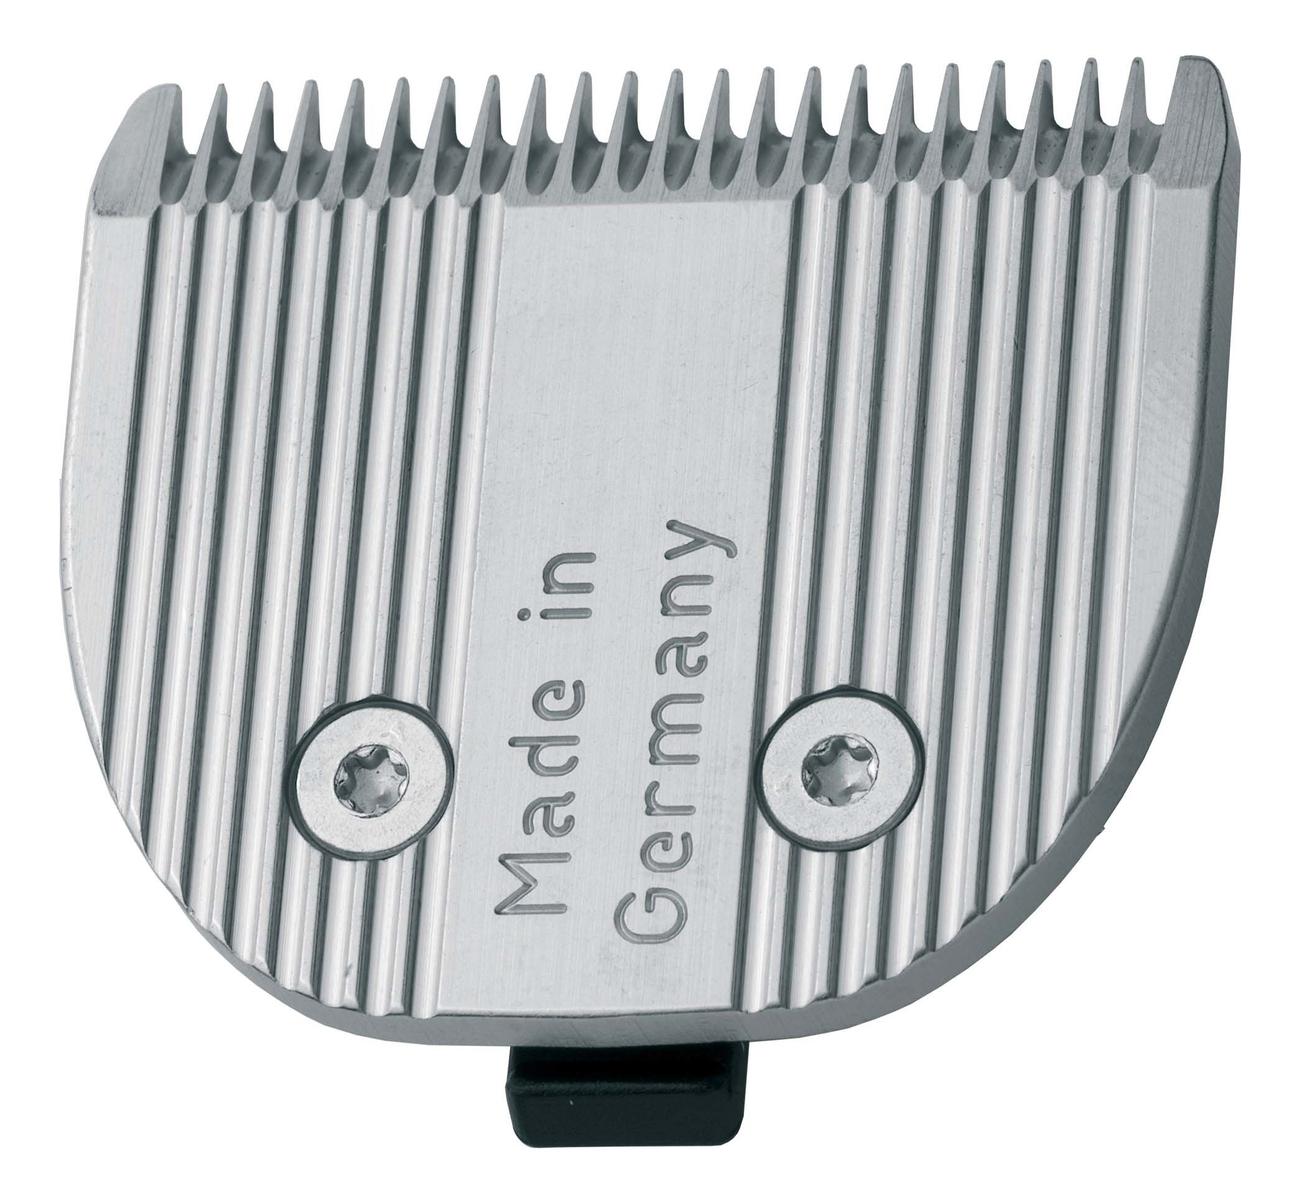 Нож Standard для машинок Genio, EasyStyle 40мм